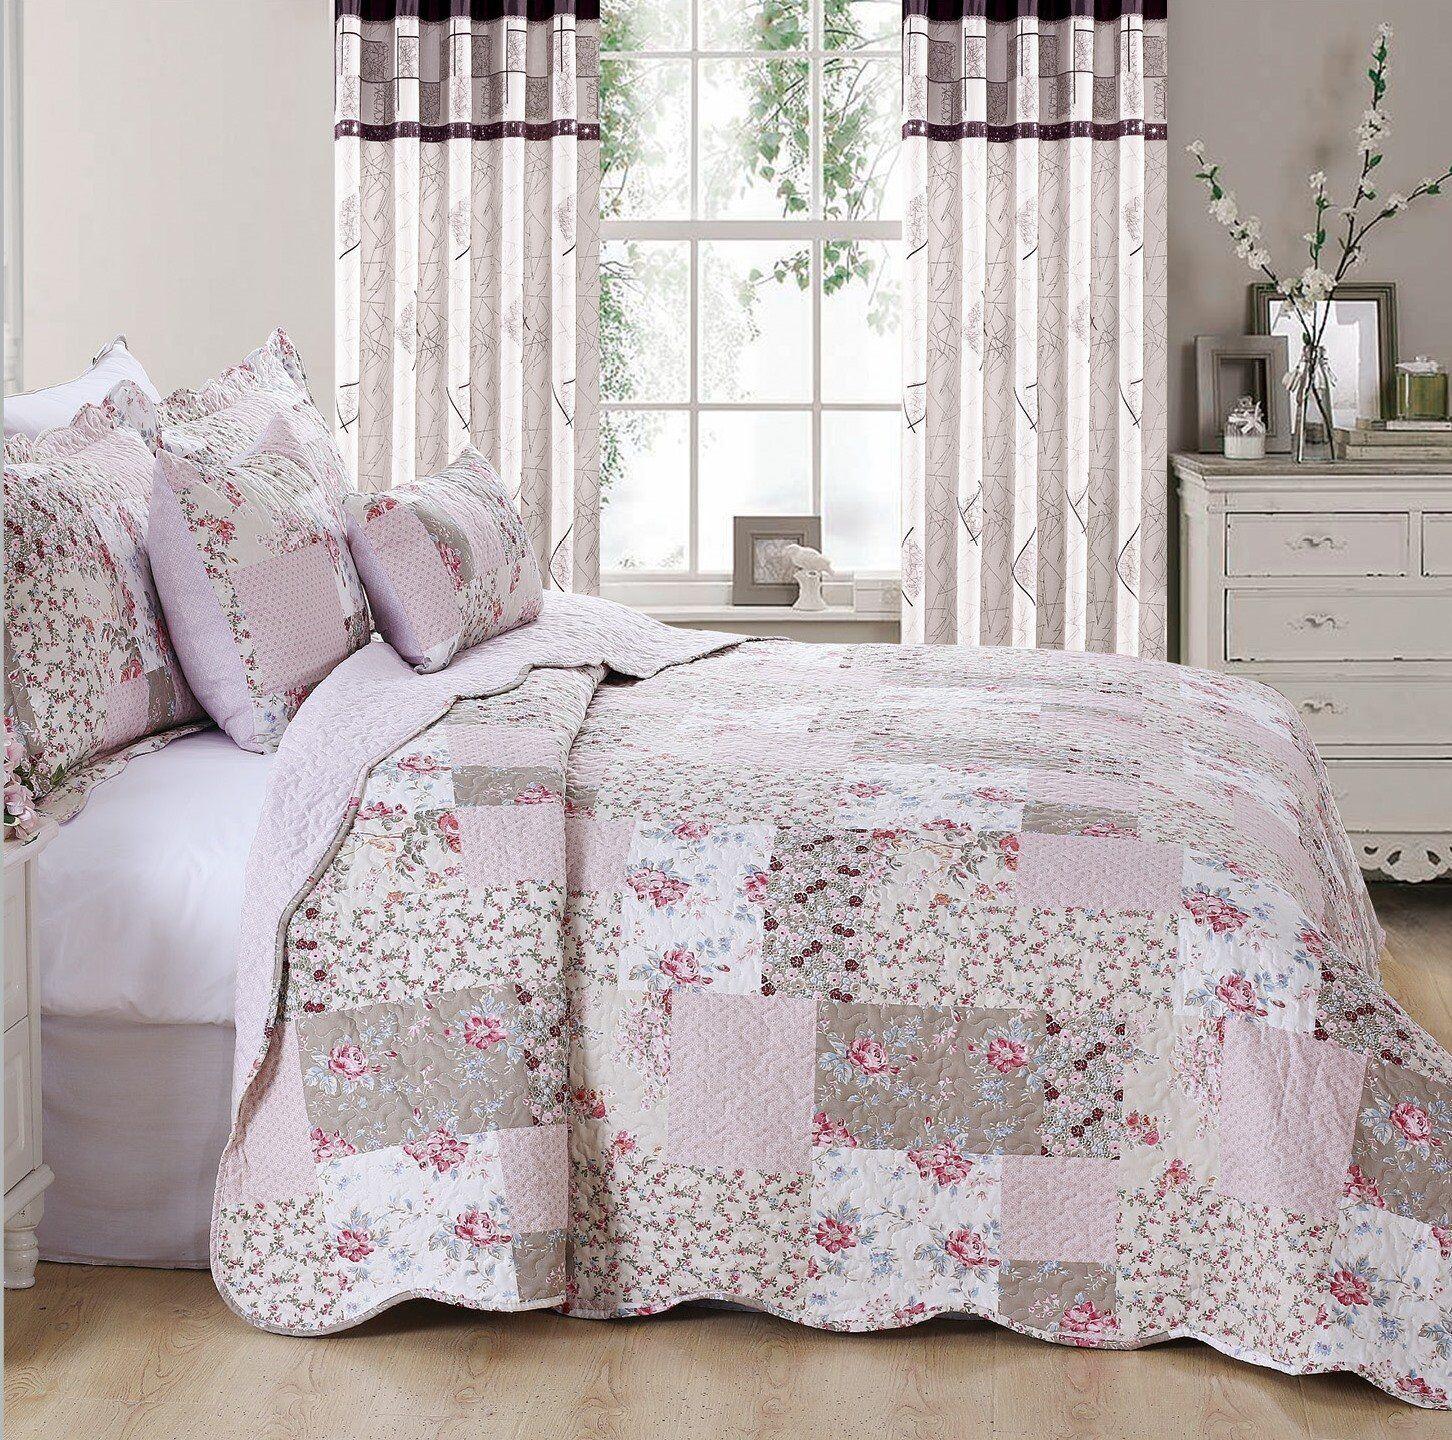 New Cotton Filled Vintage Patchwork Quilted Bedspread Throw Comforter King Größe